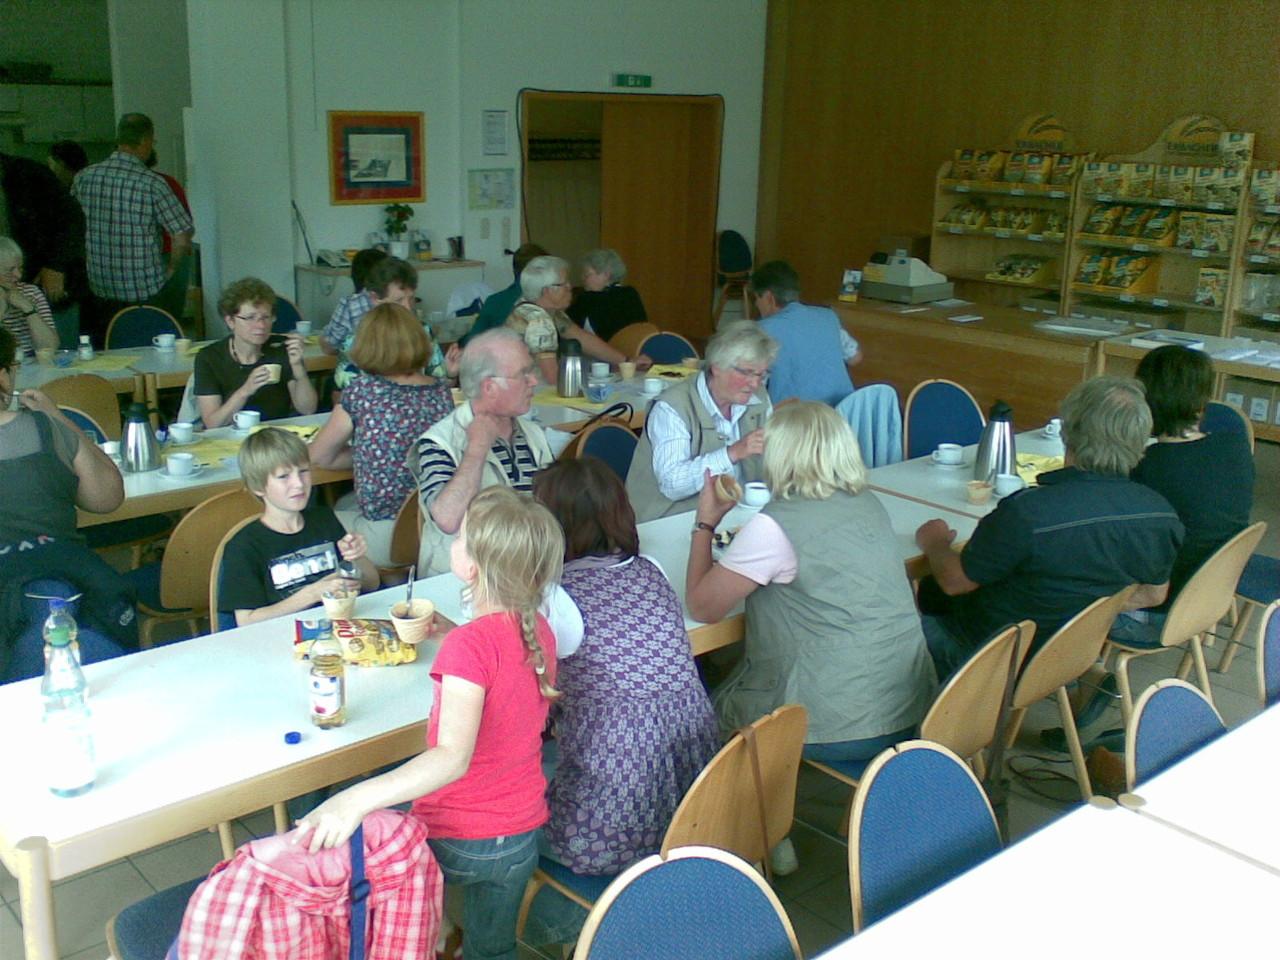 Vortrag bei Erbacher - 22.07.11 - Verkostung